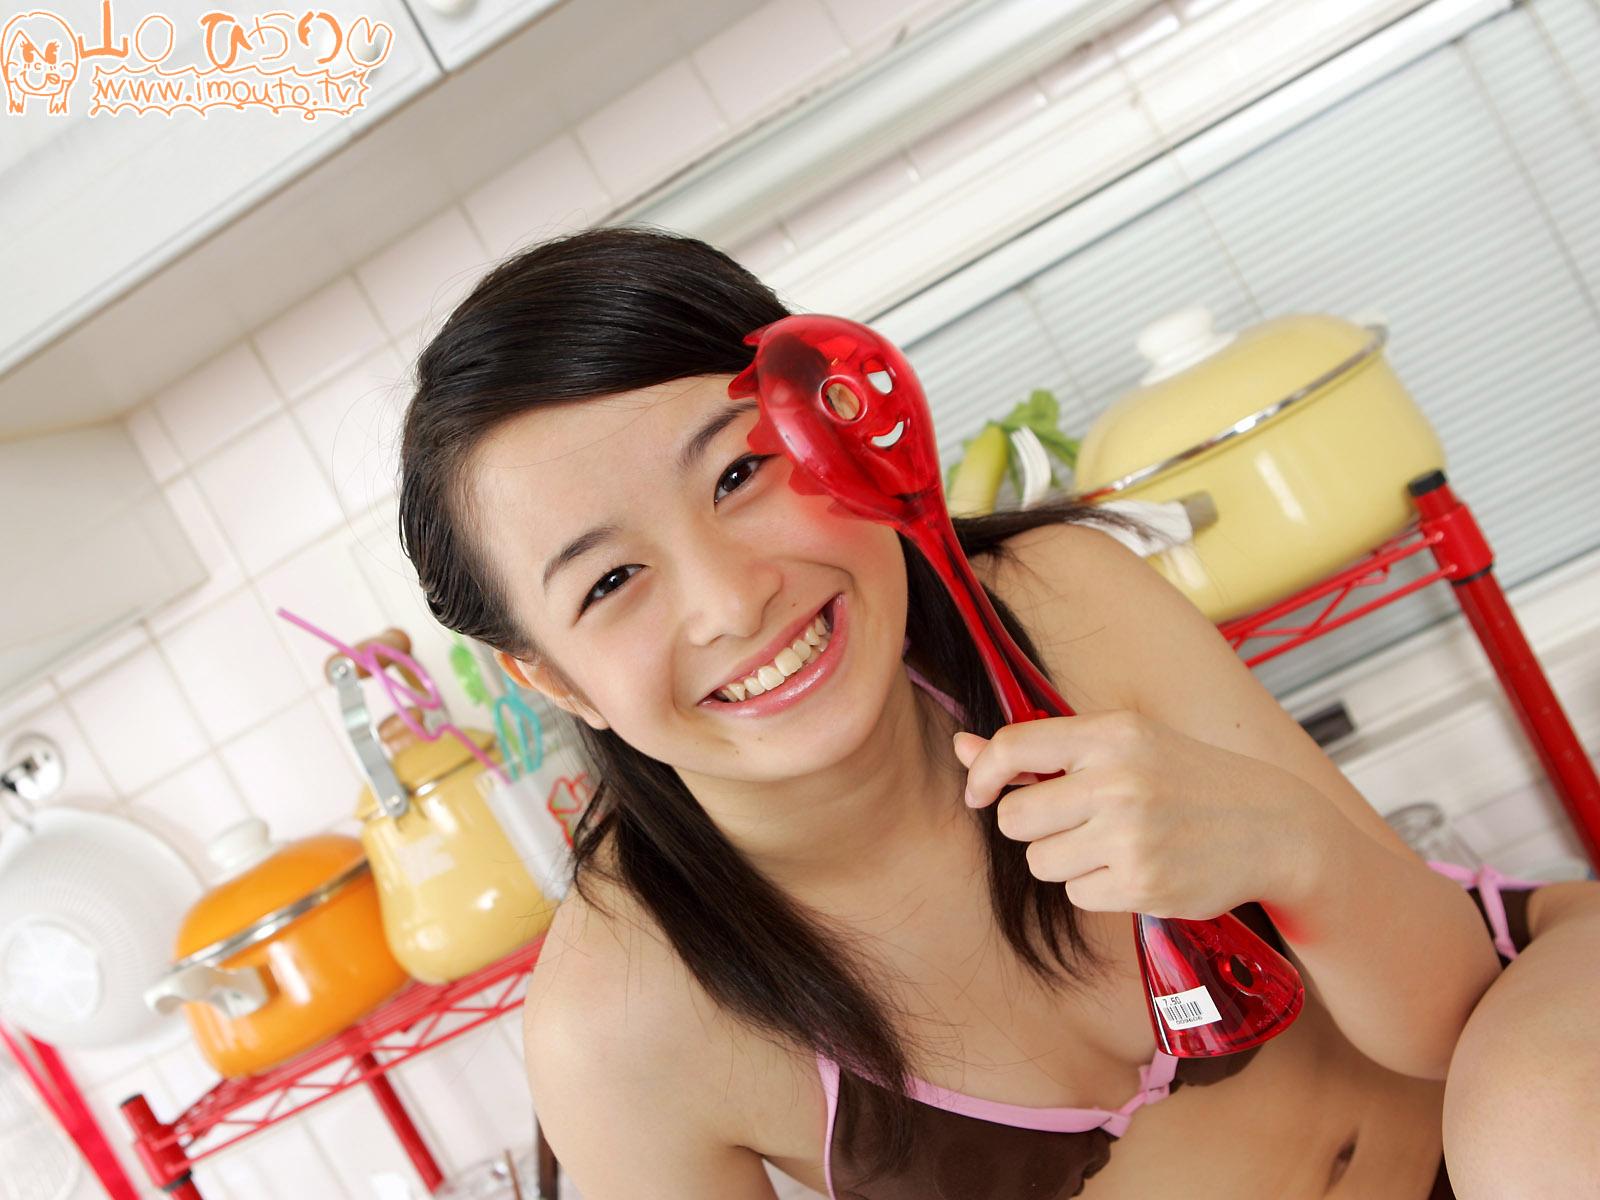 Japanese junior high schoolgirl idol photo book 13 years old